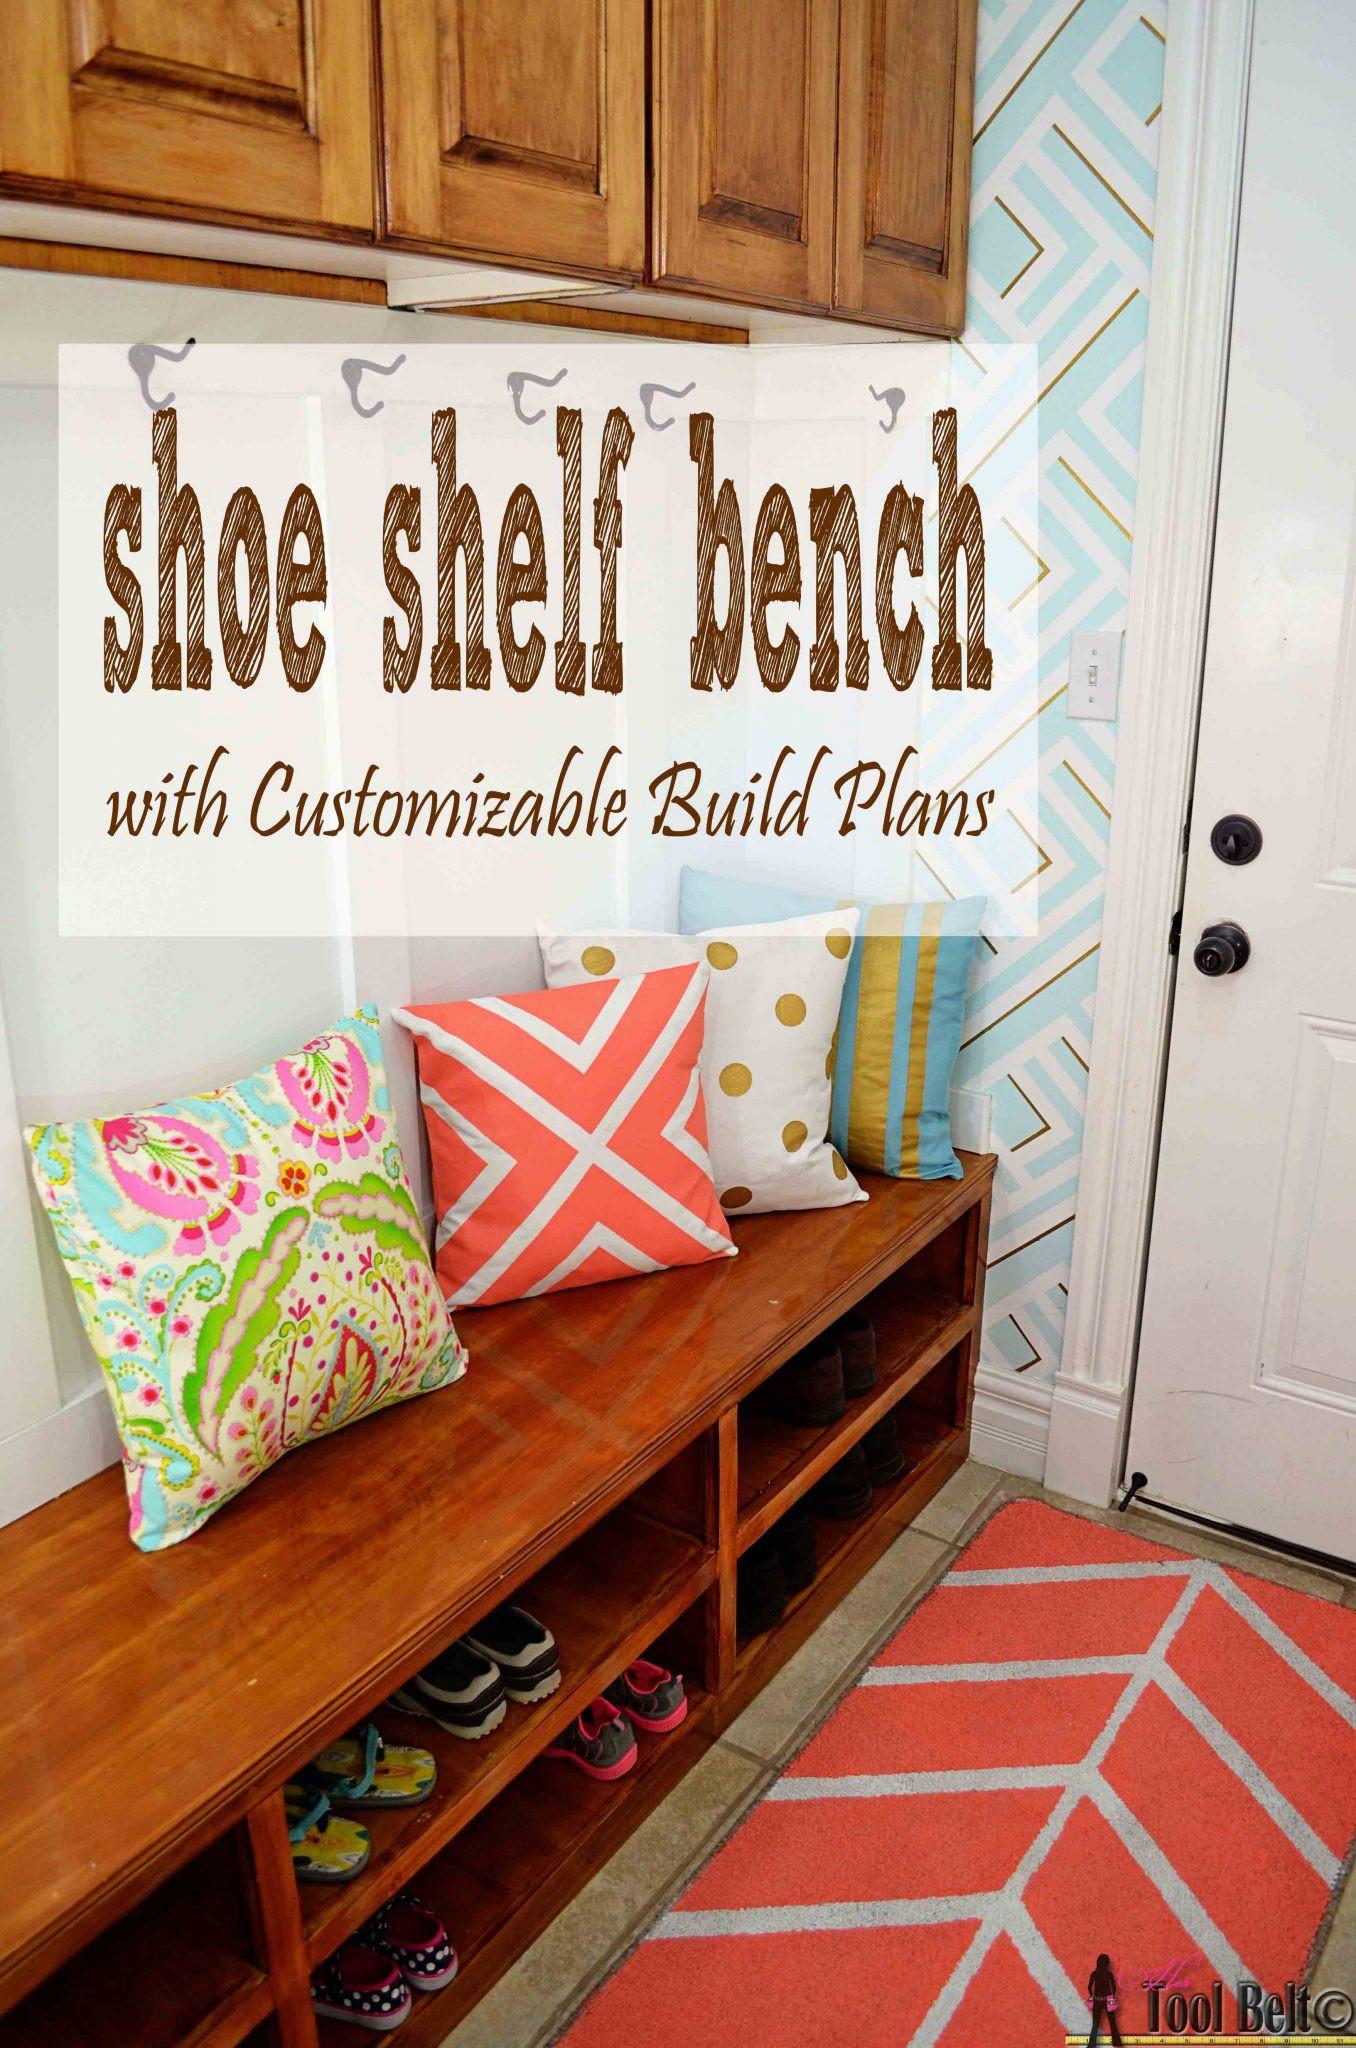 Best ideas about DIY Shoe Shelf . Save or Pin Shoe Shelf Bench Her Tool Belt Now.